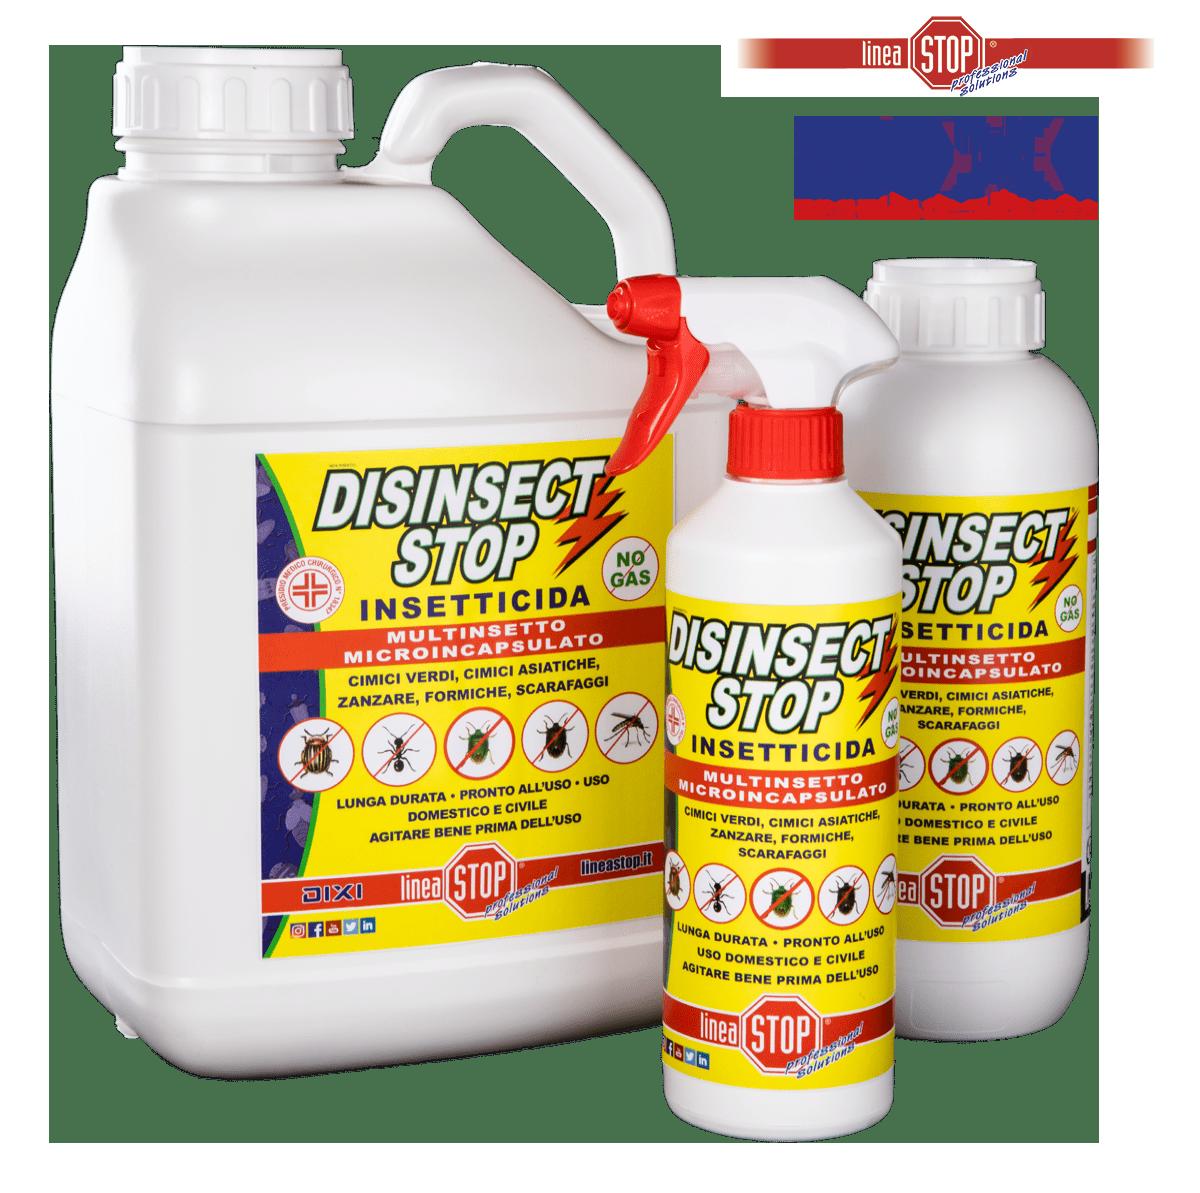 Disinsect stop insetticida linea stop DIXI